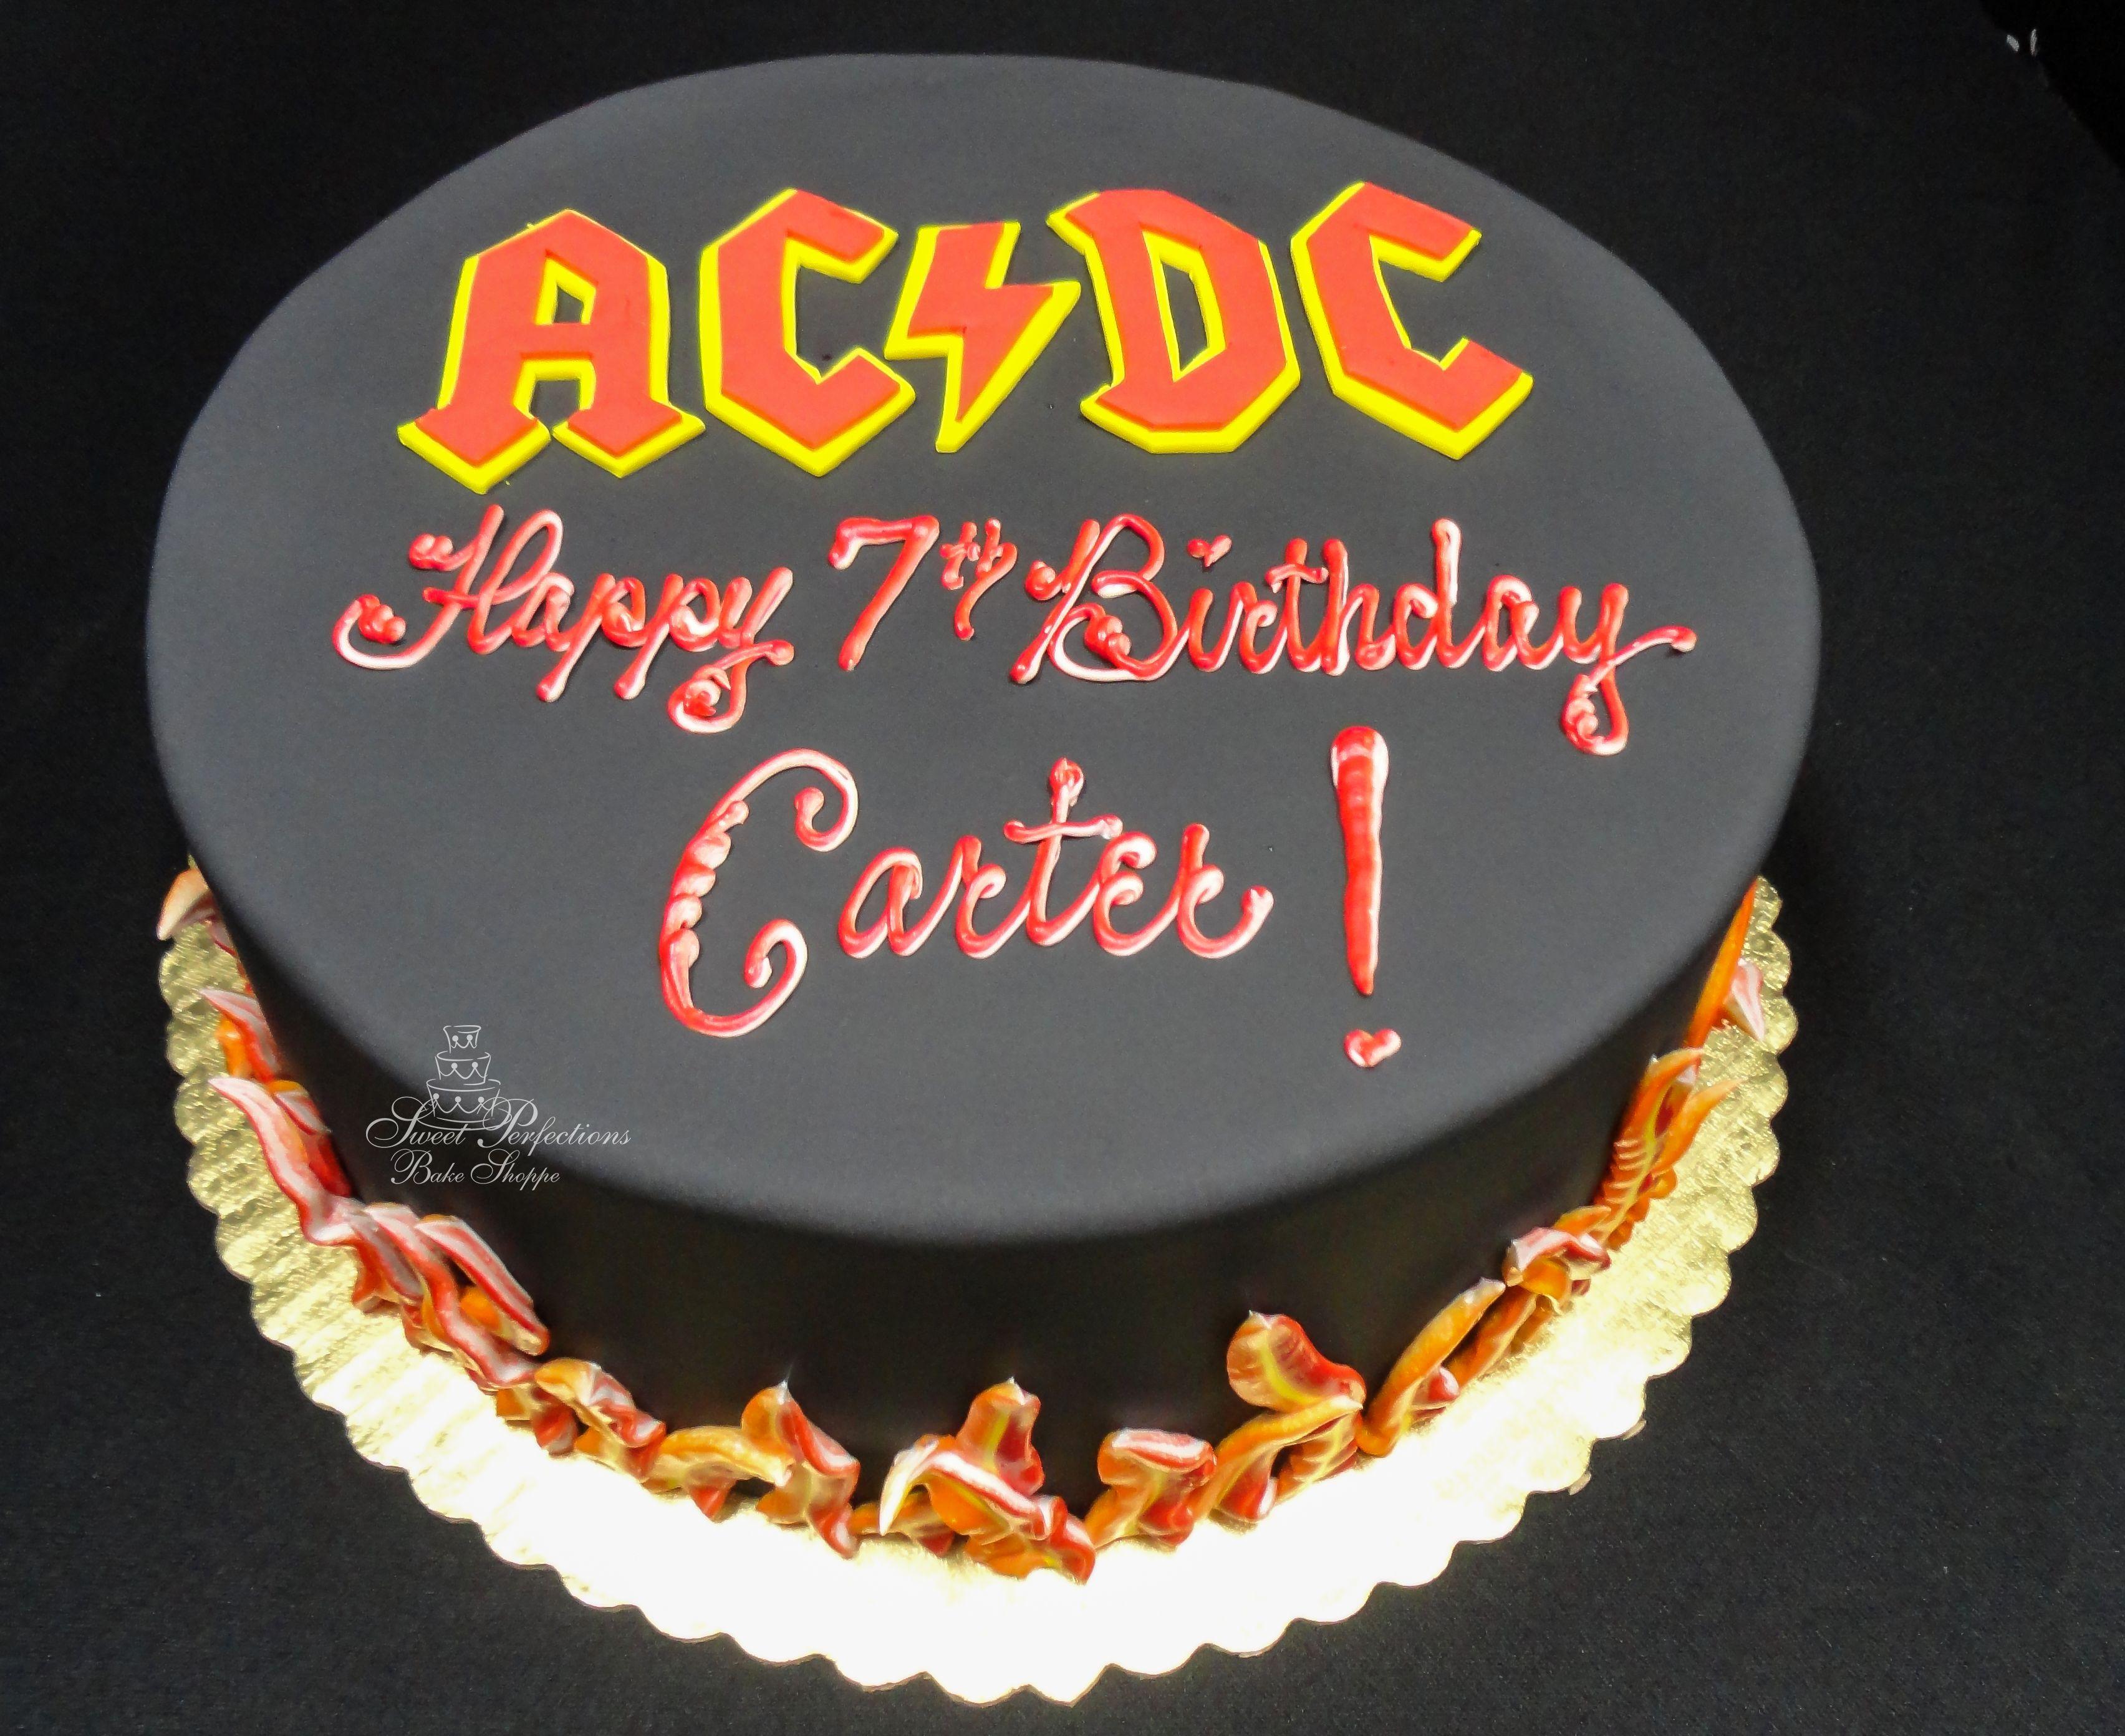 Custom ACDC Birthday Cake by SweetPerfections in Waukesha